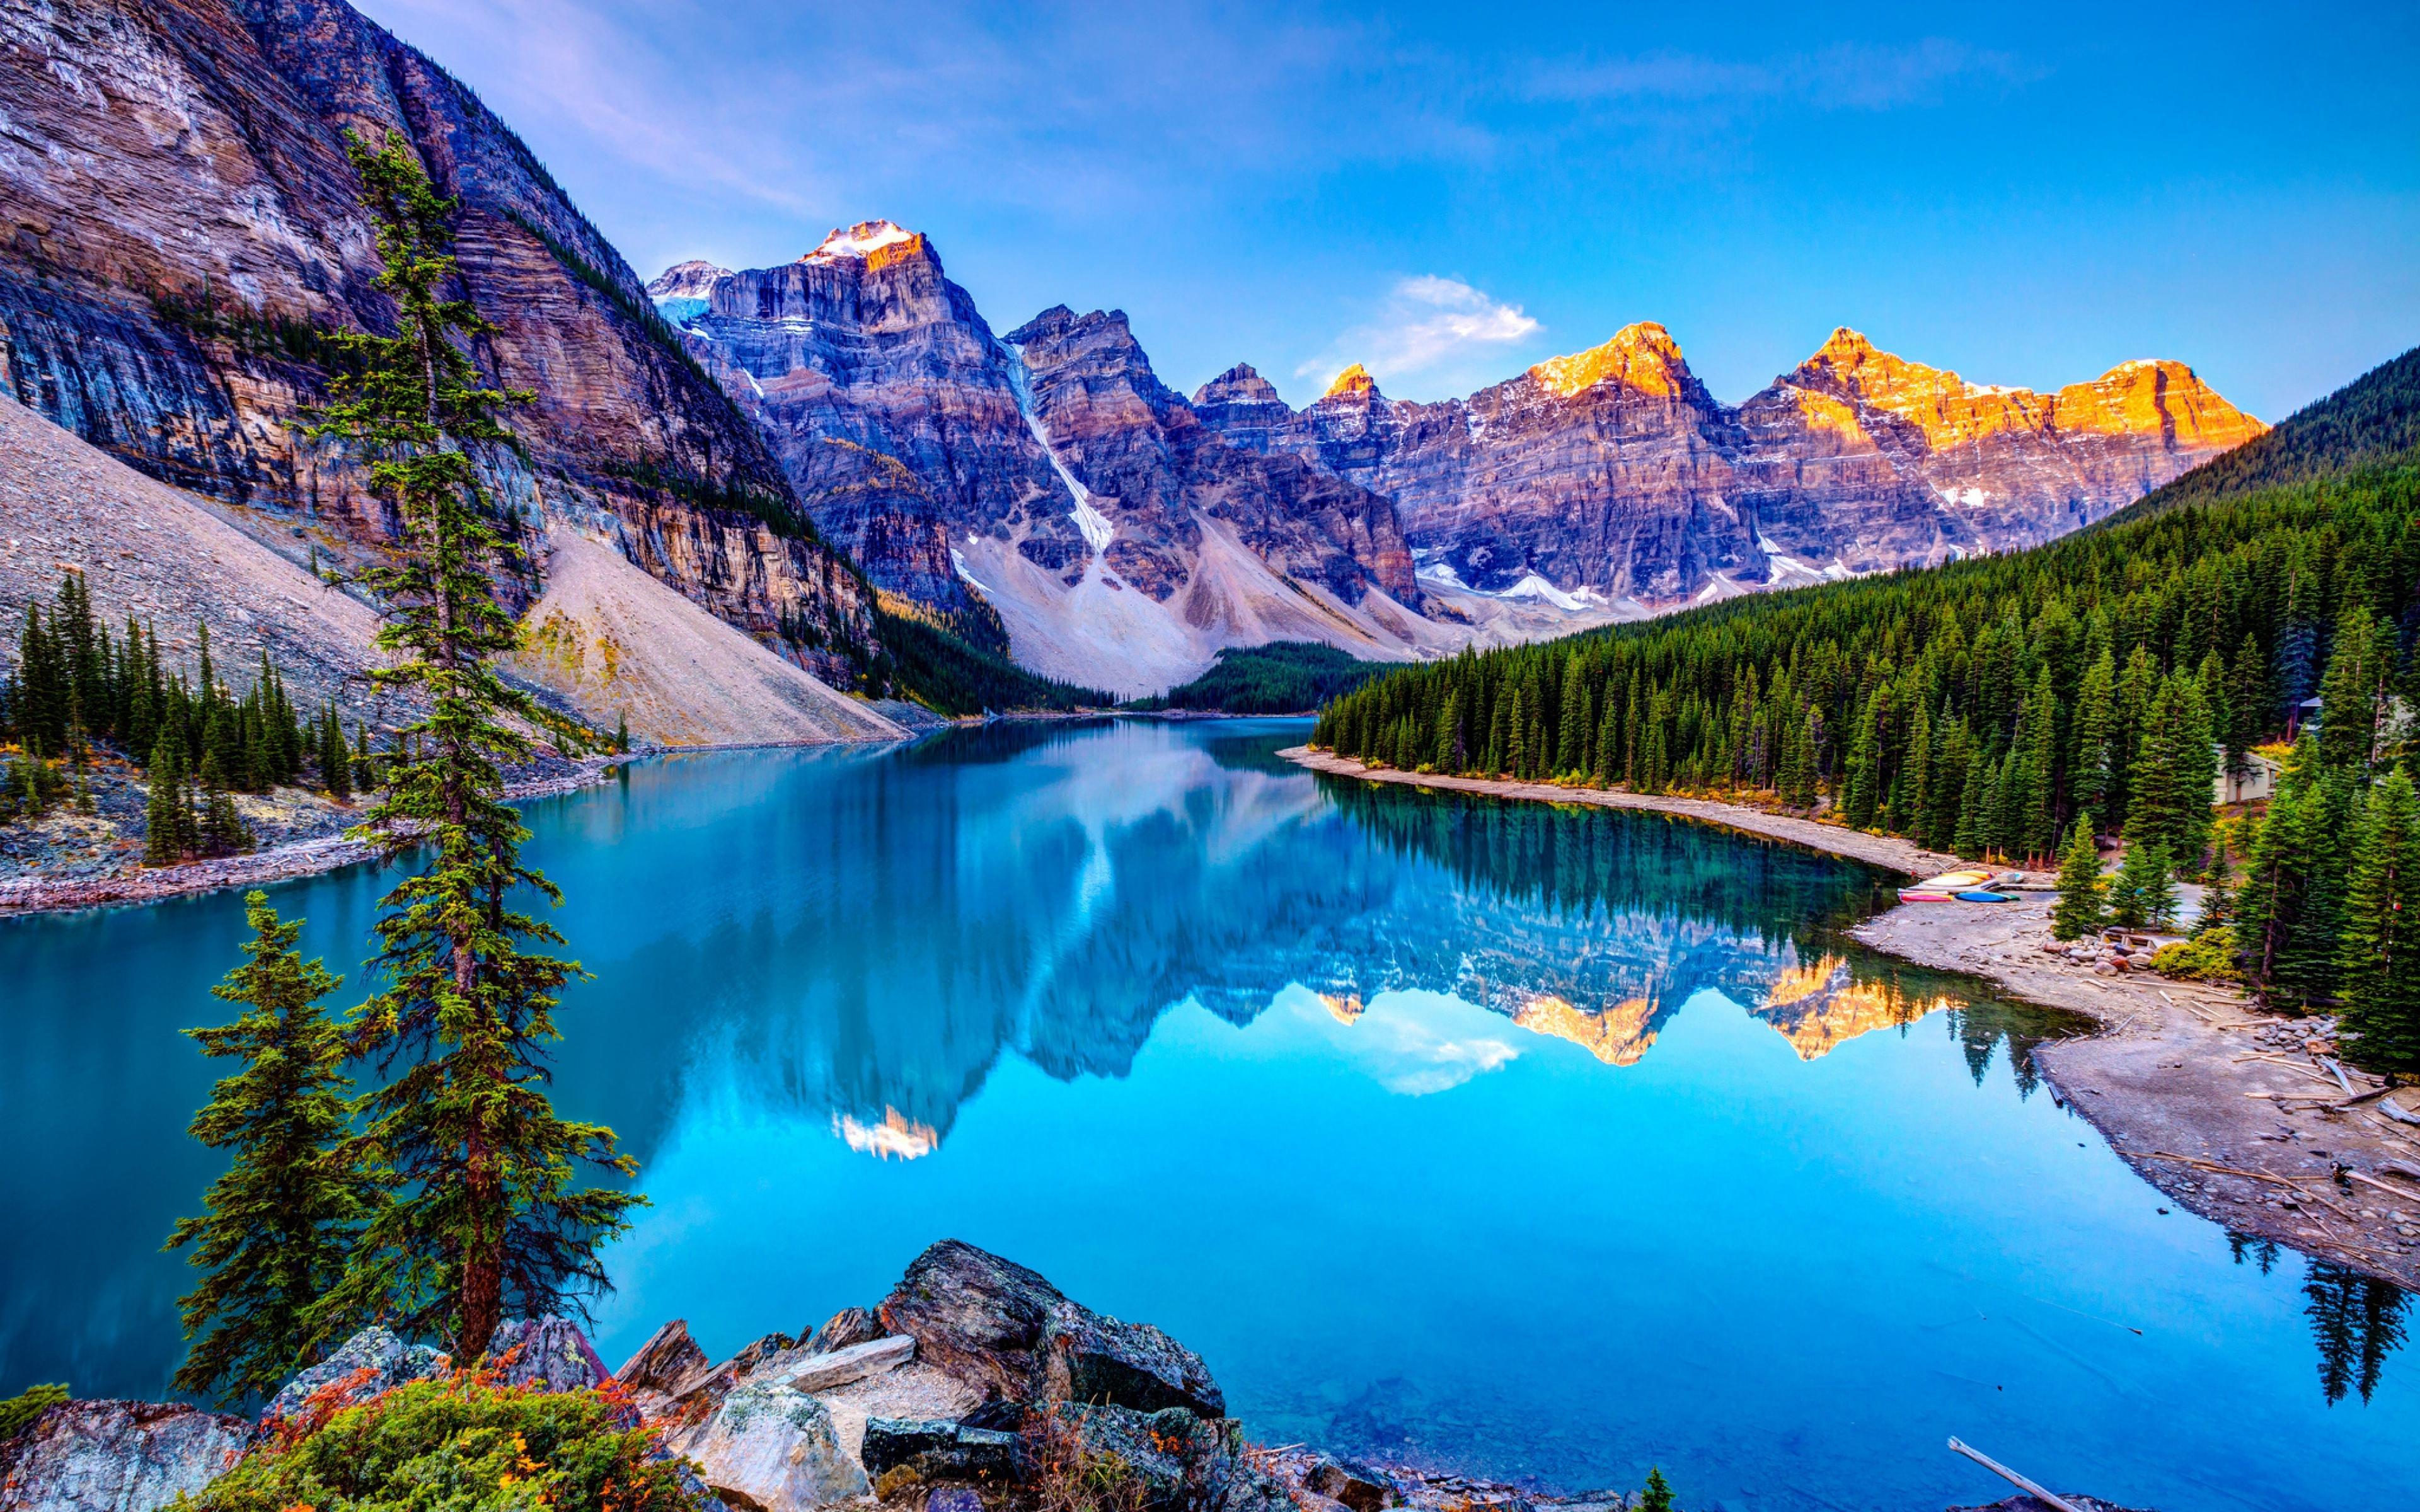 Download HD Mountains Sky Blue Lake Reflection Clouds Wallpaper 3840x2400